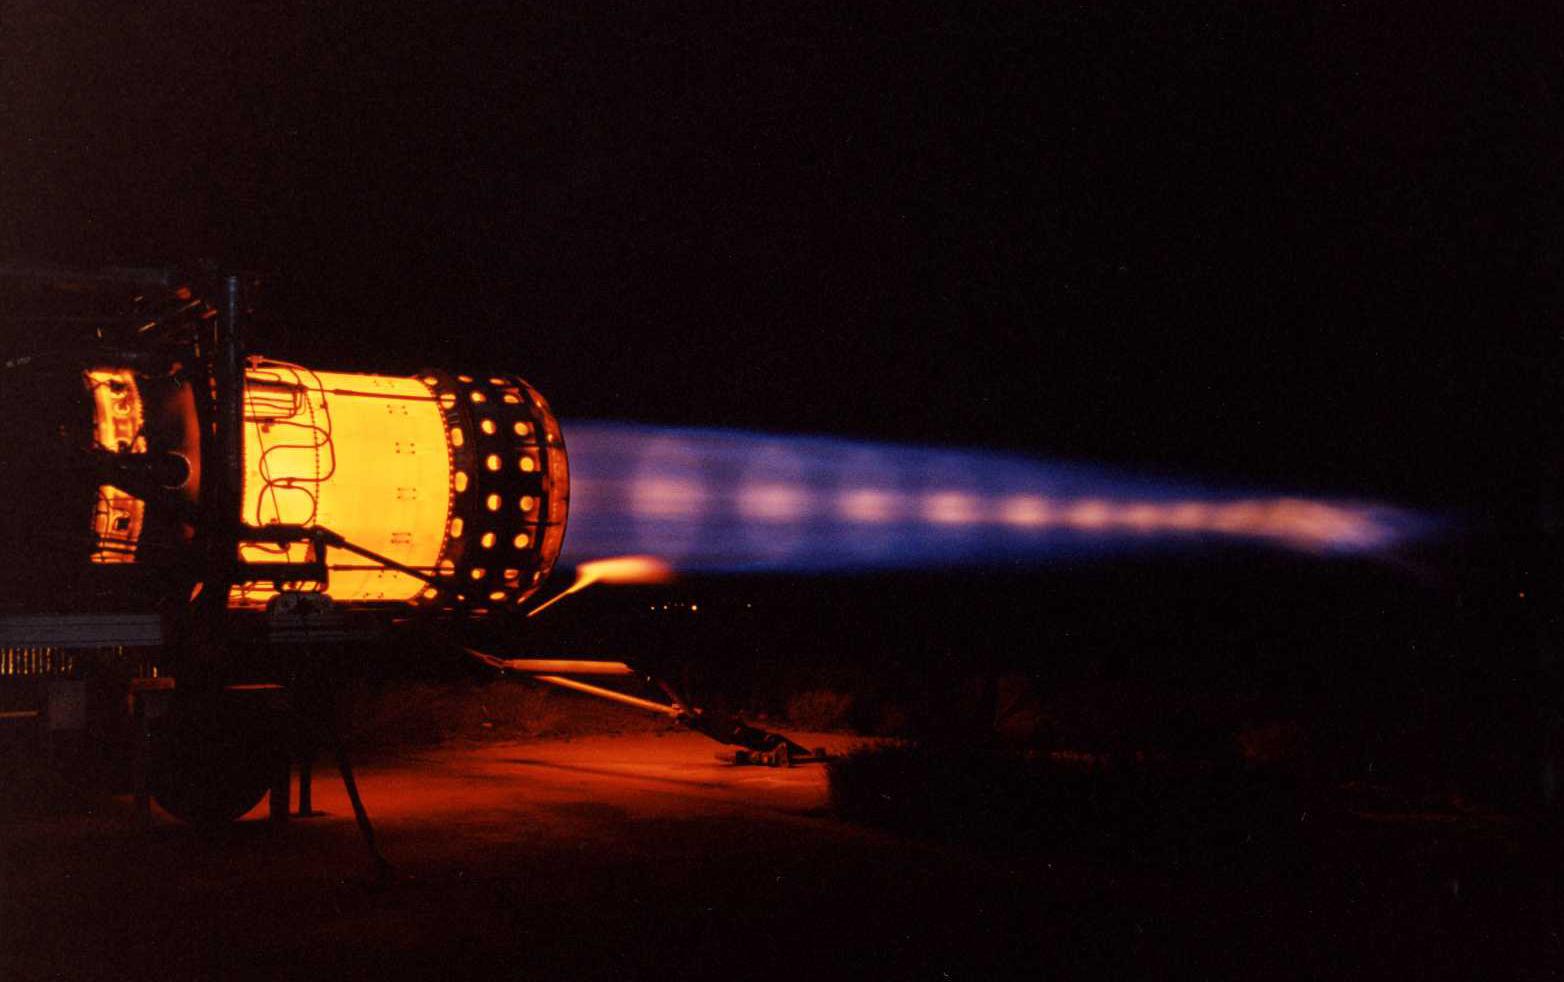 J58_Afterburner.jpg